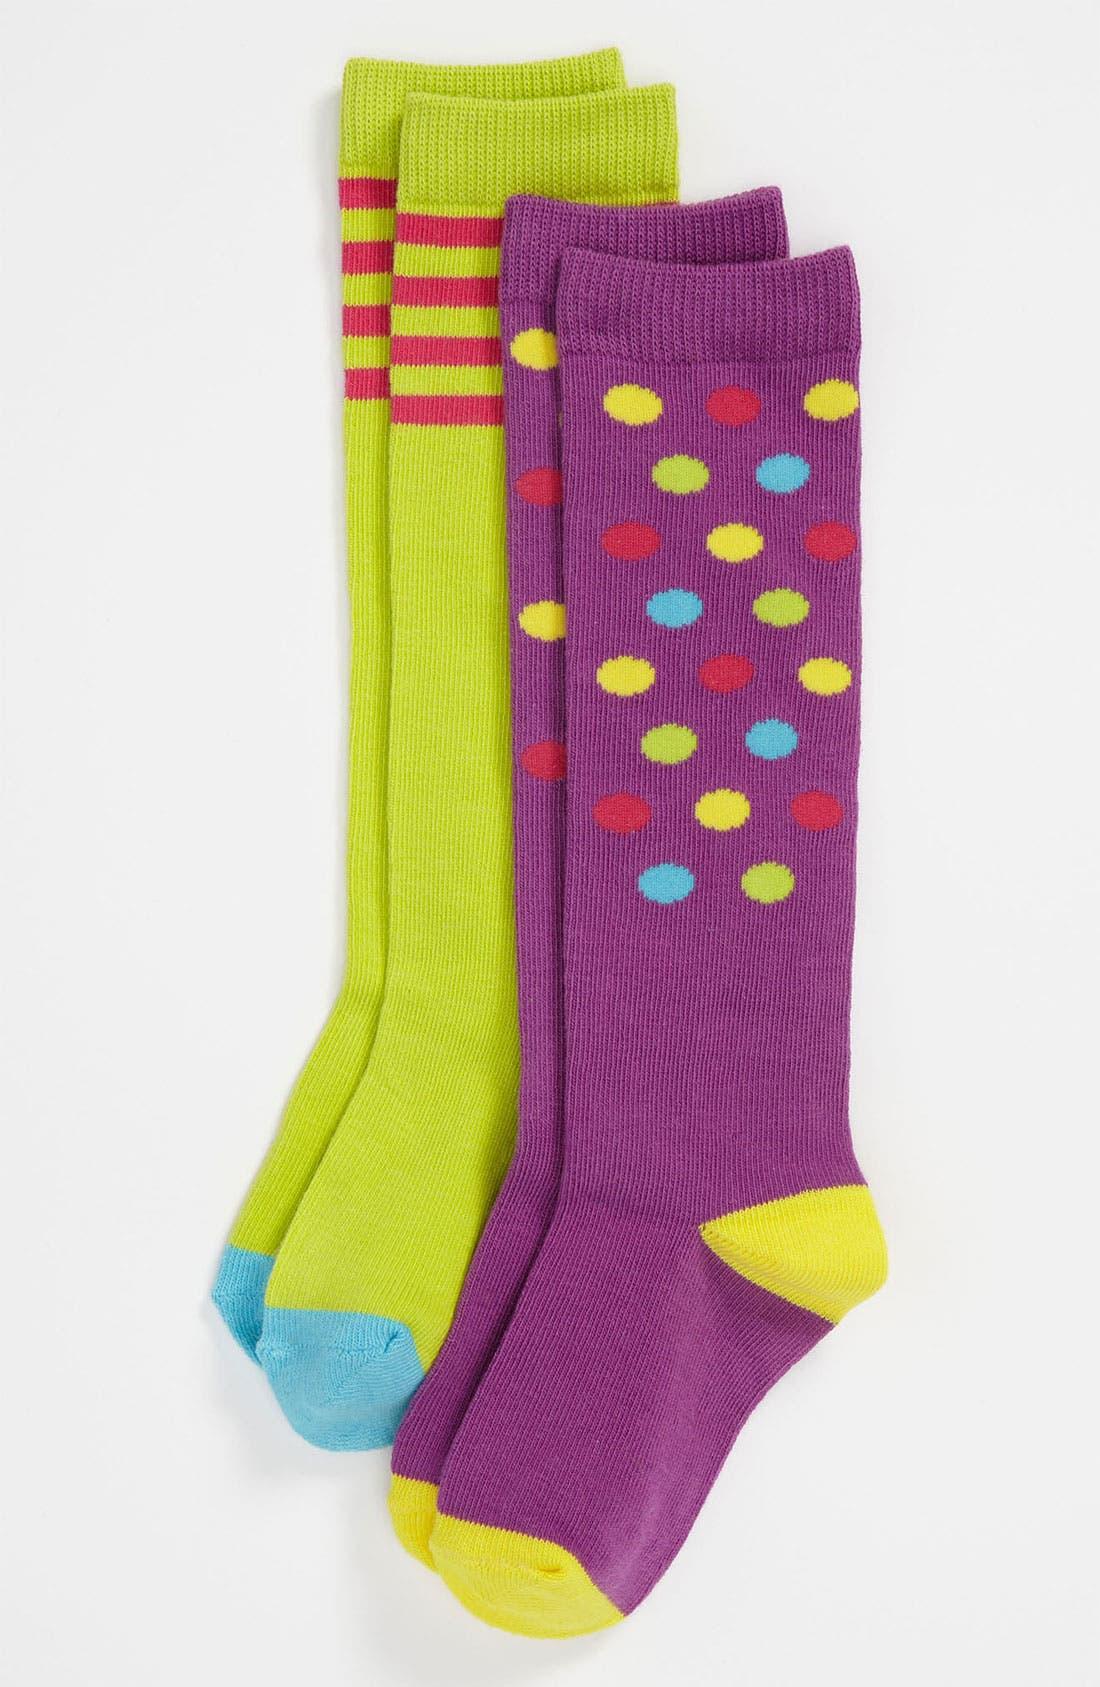 Main Image - Nordstrom 'Mix & Match' Knee Socks (2-Pack) (Girls)